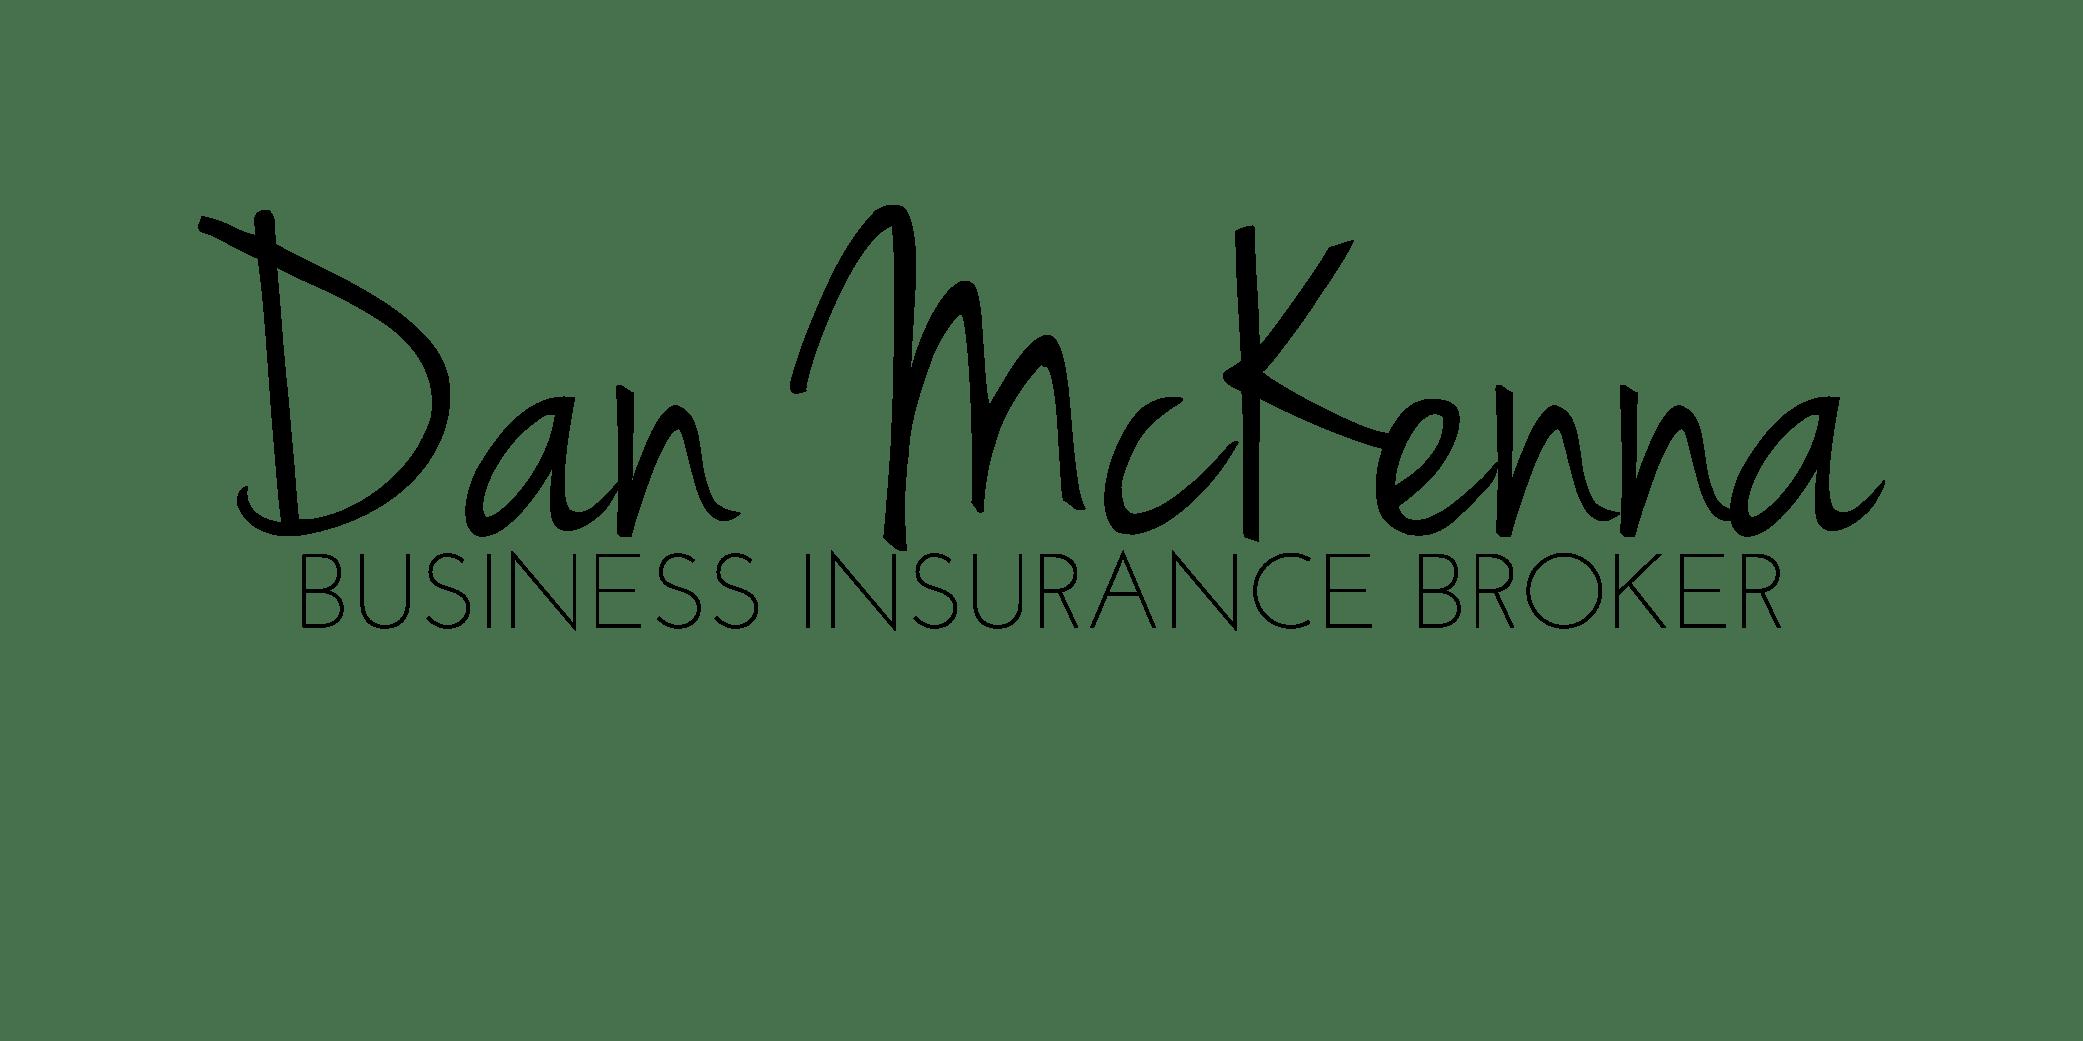 Business Insurance | CSS INSURANCE SERVICES LLC